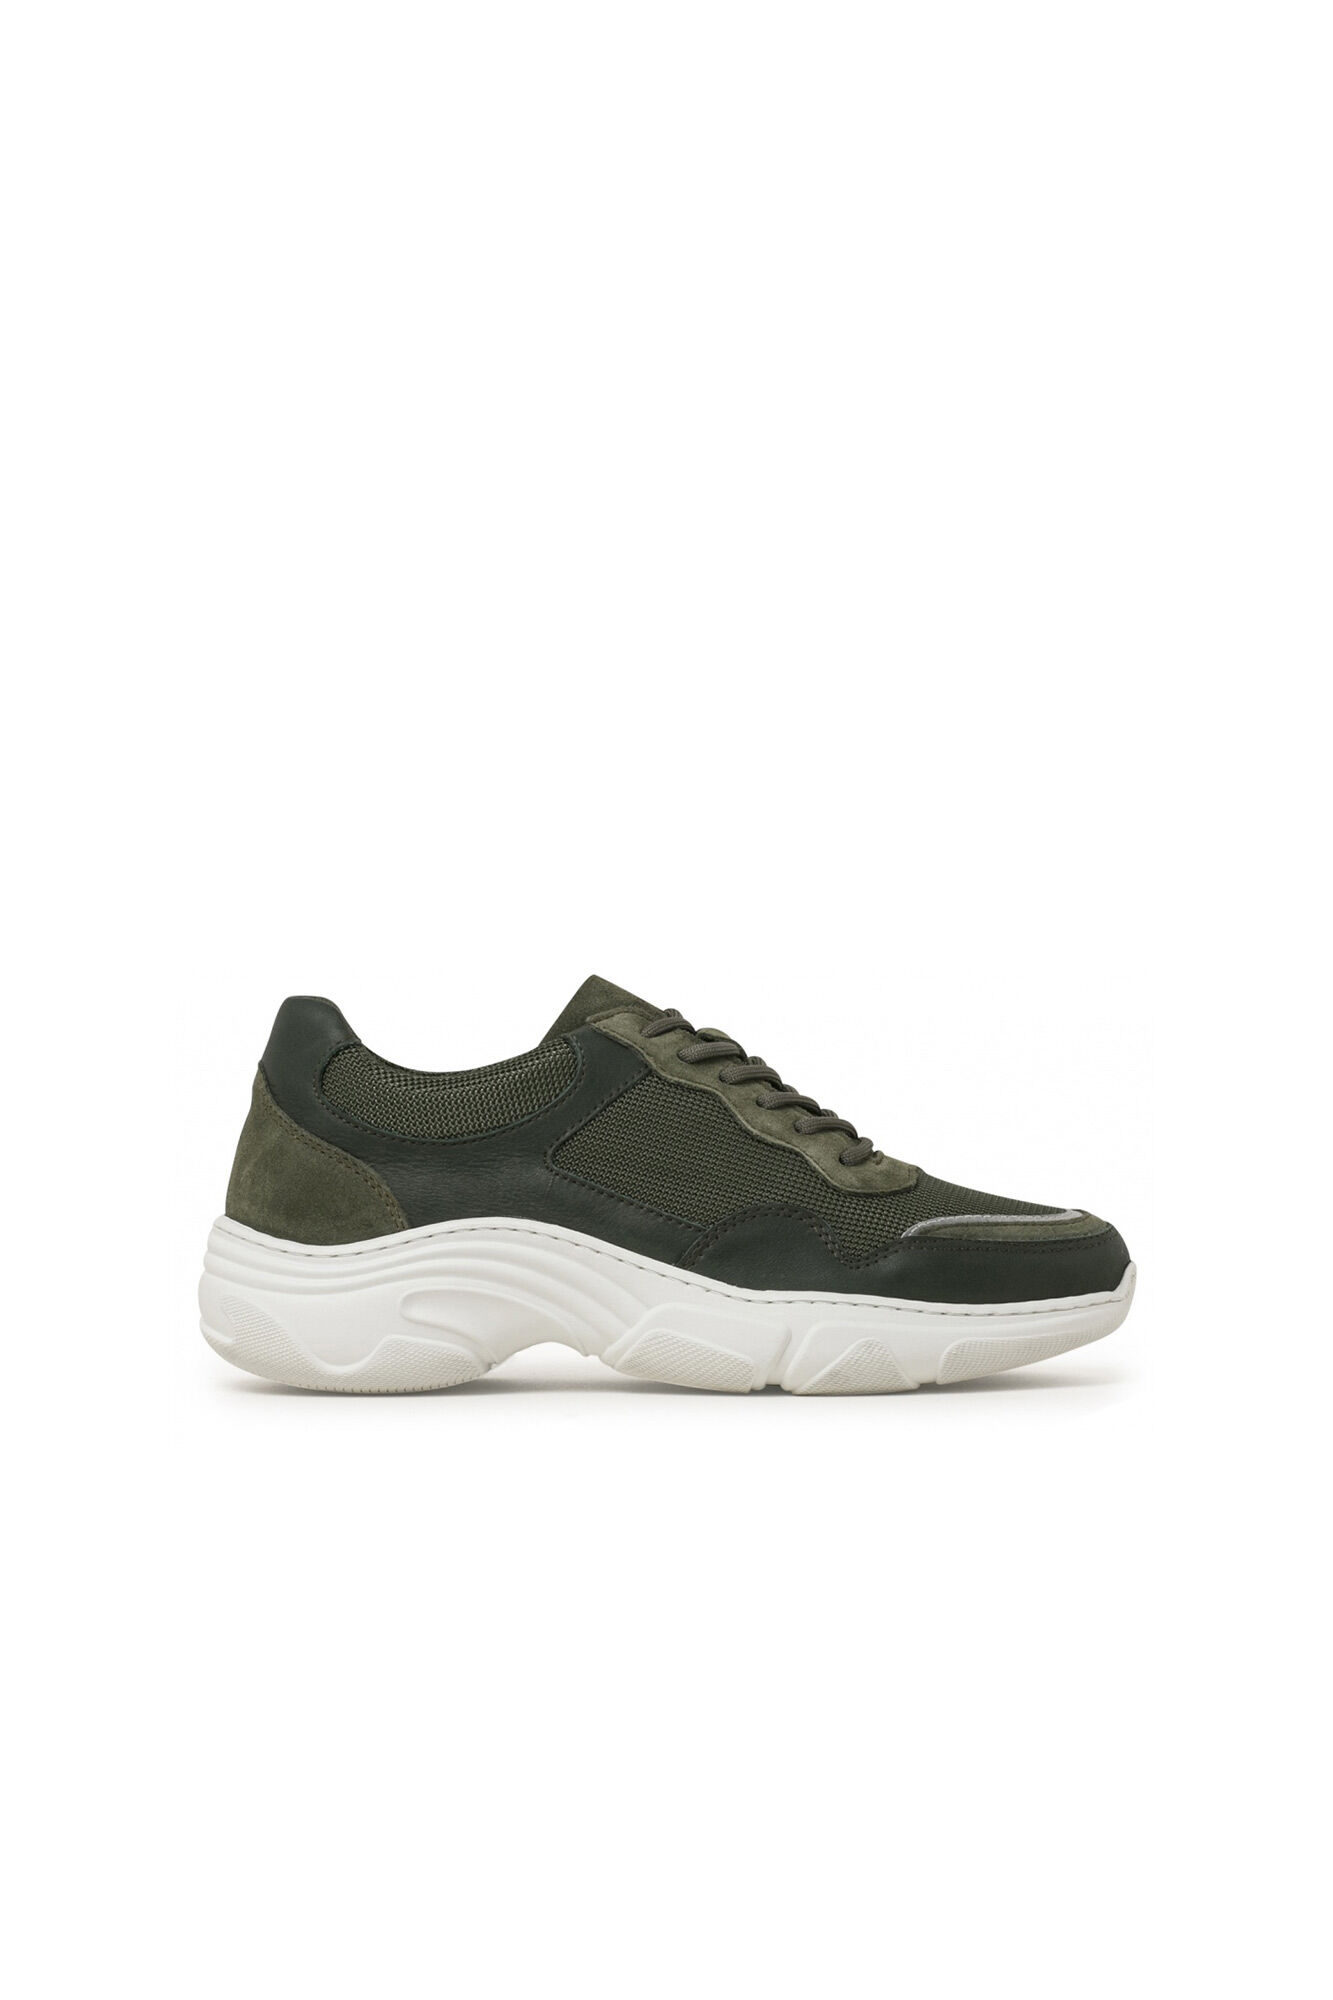 Flex sneaker GP1926, ARMY